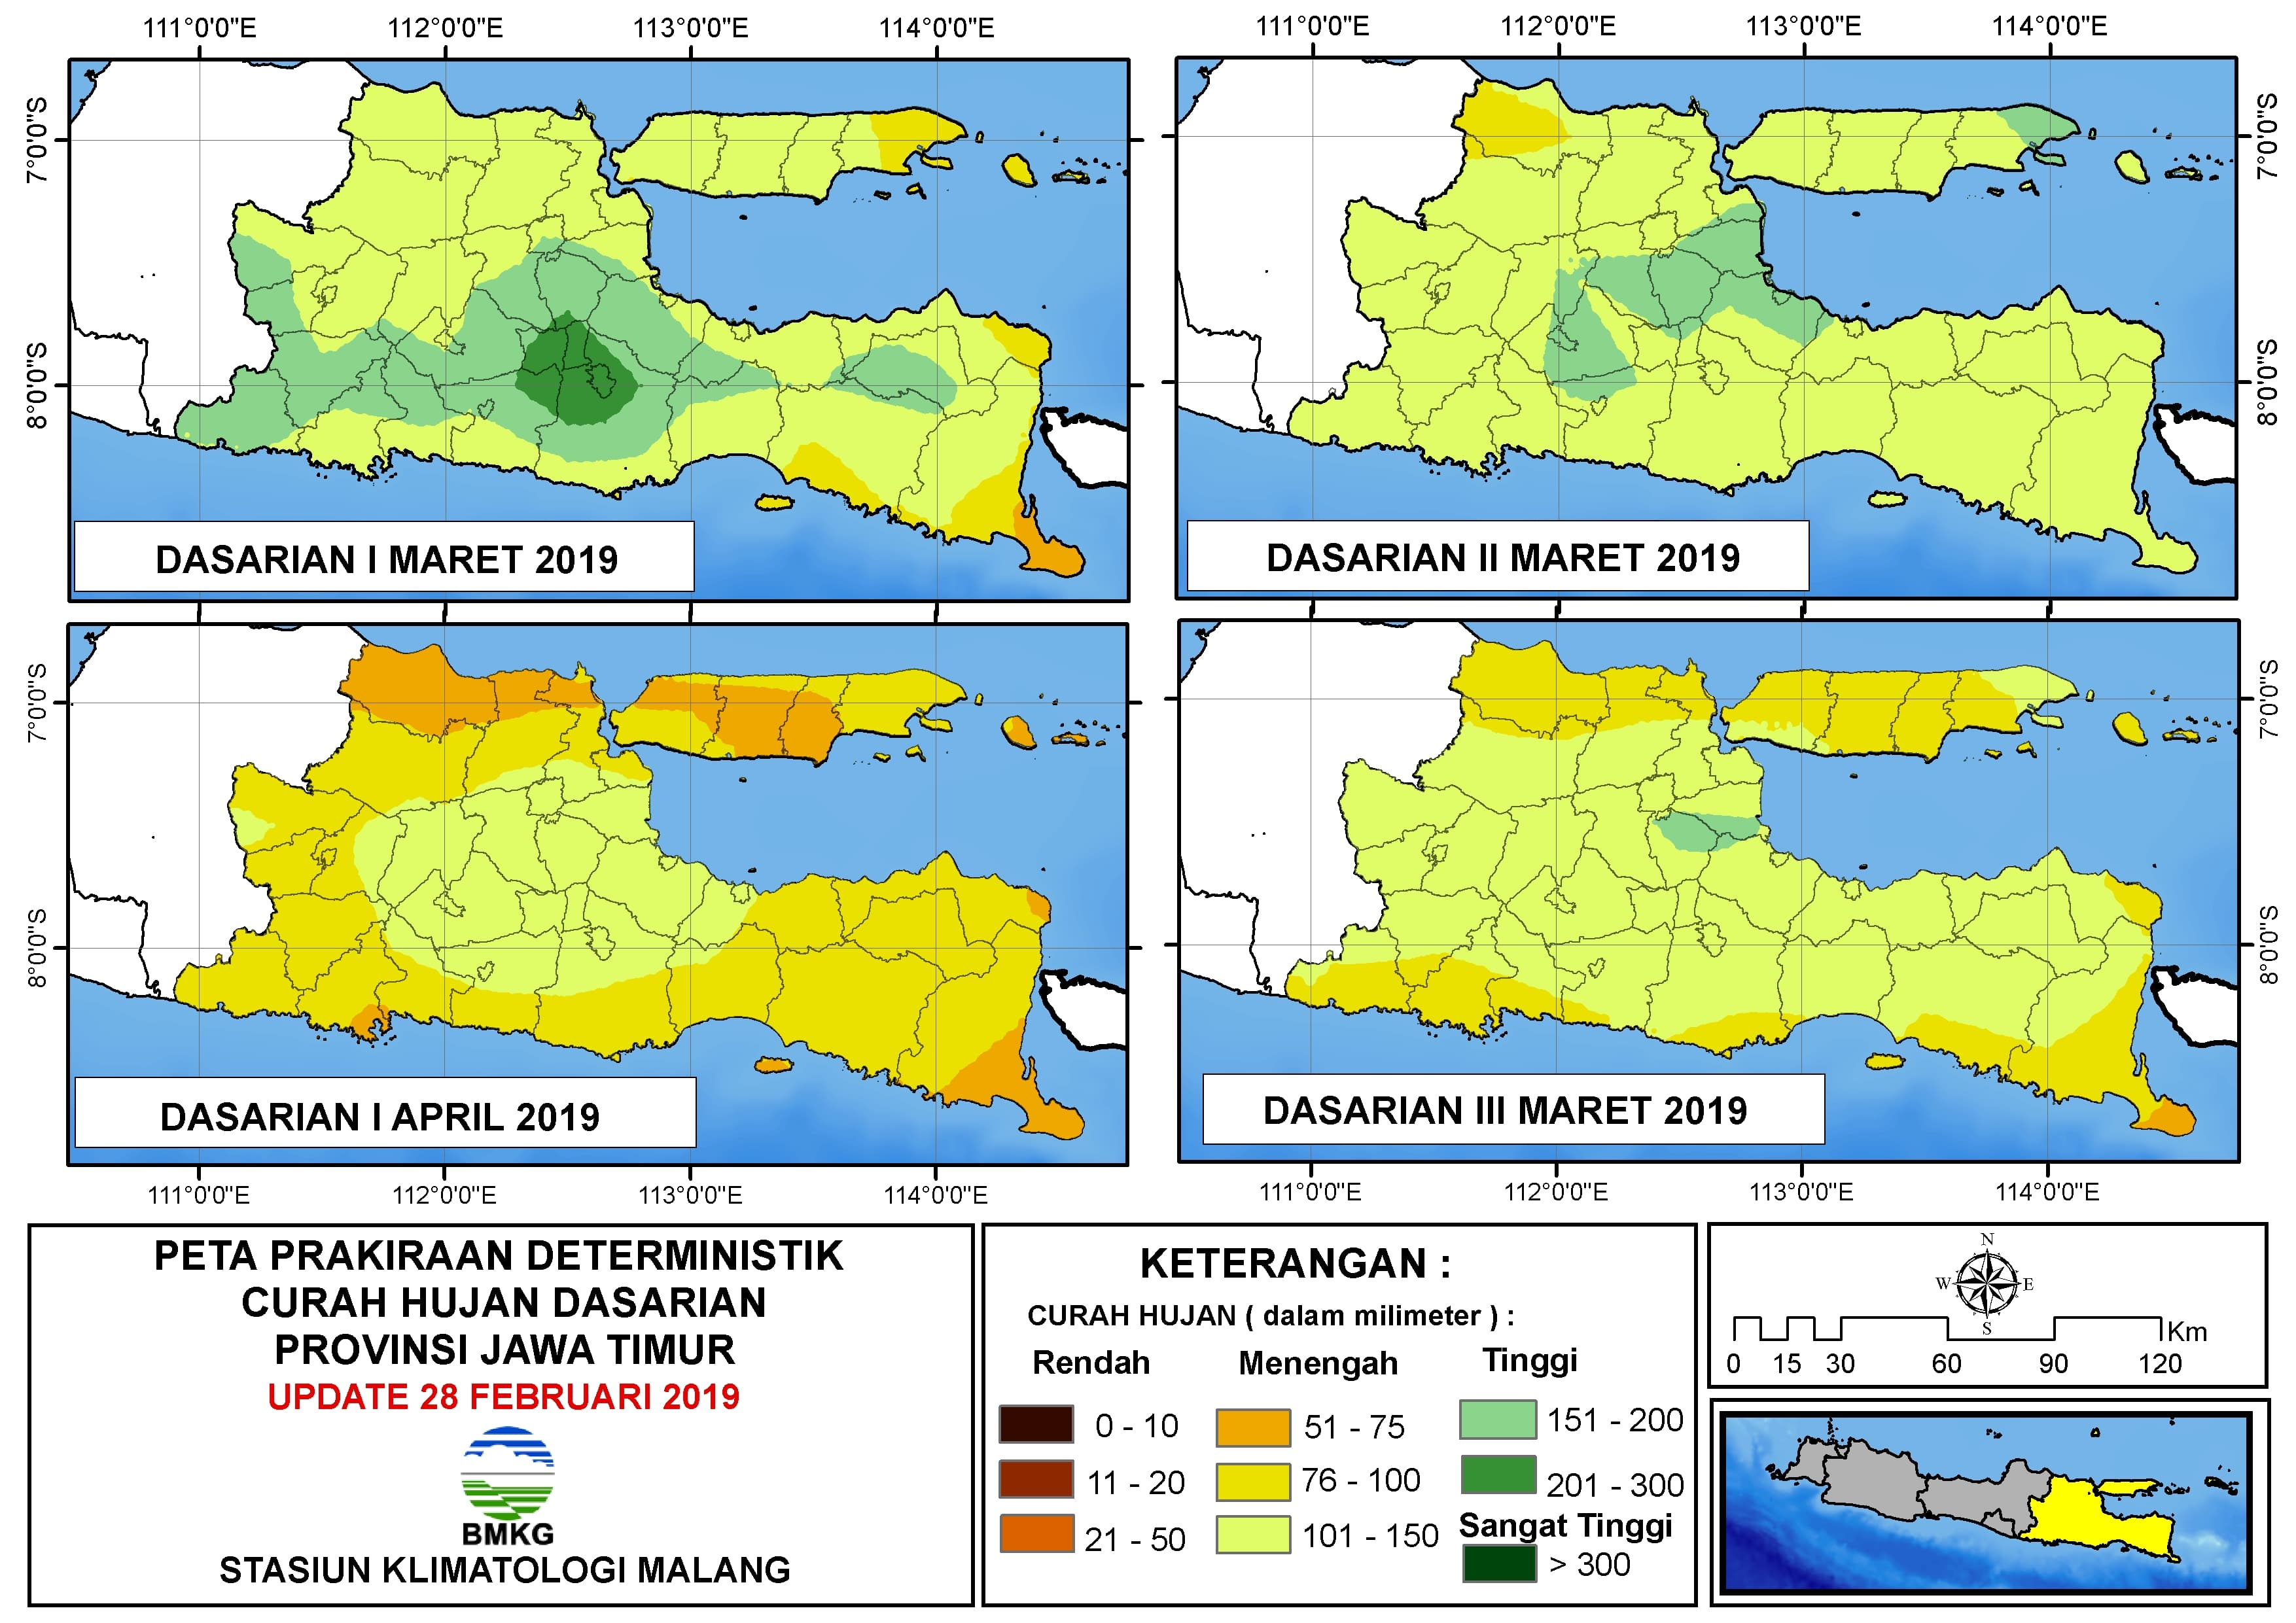 Peta Prakiraan Deterministik Curah Hujan Dasarian Provinsi Jawa Timur Update 28 Februari 2019